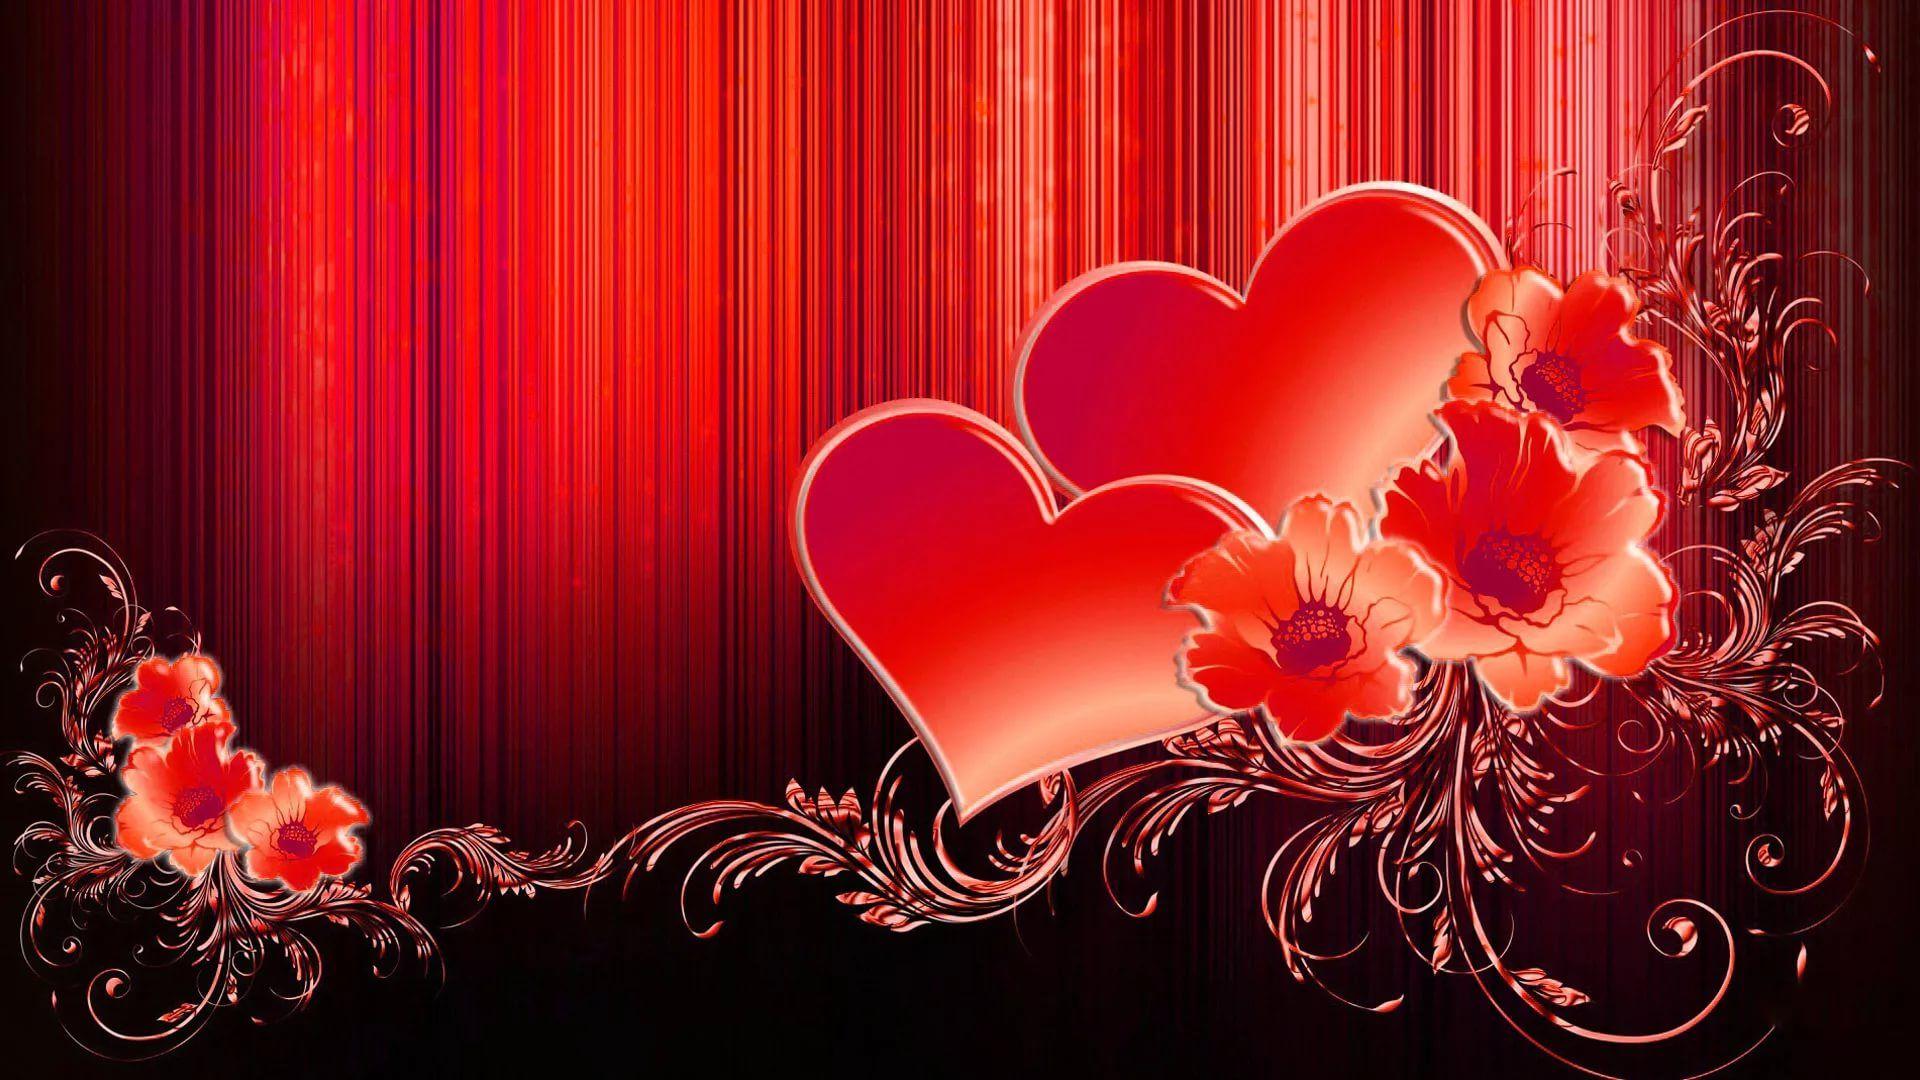 Valentine Screensaver wallpaper image hd